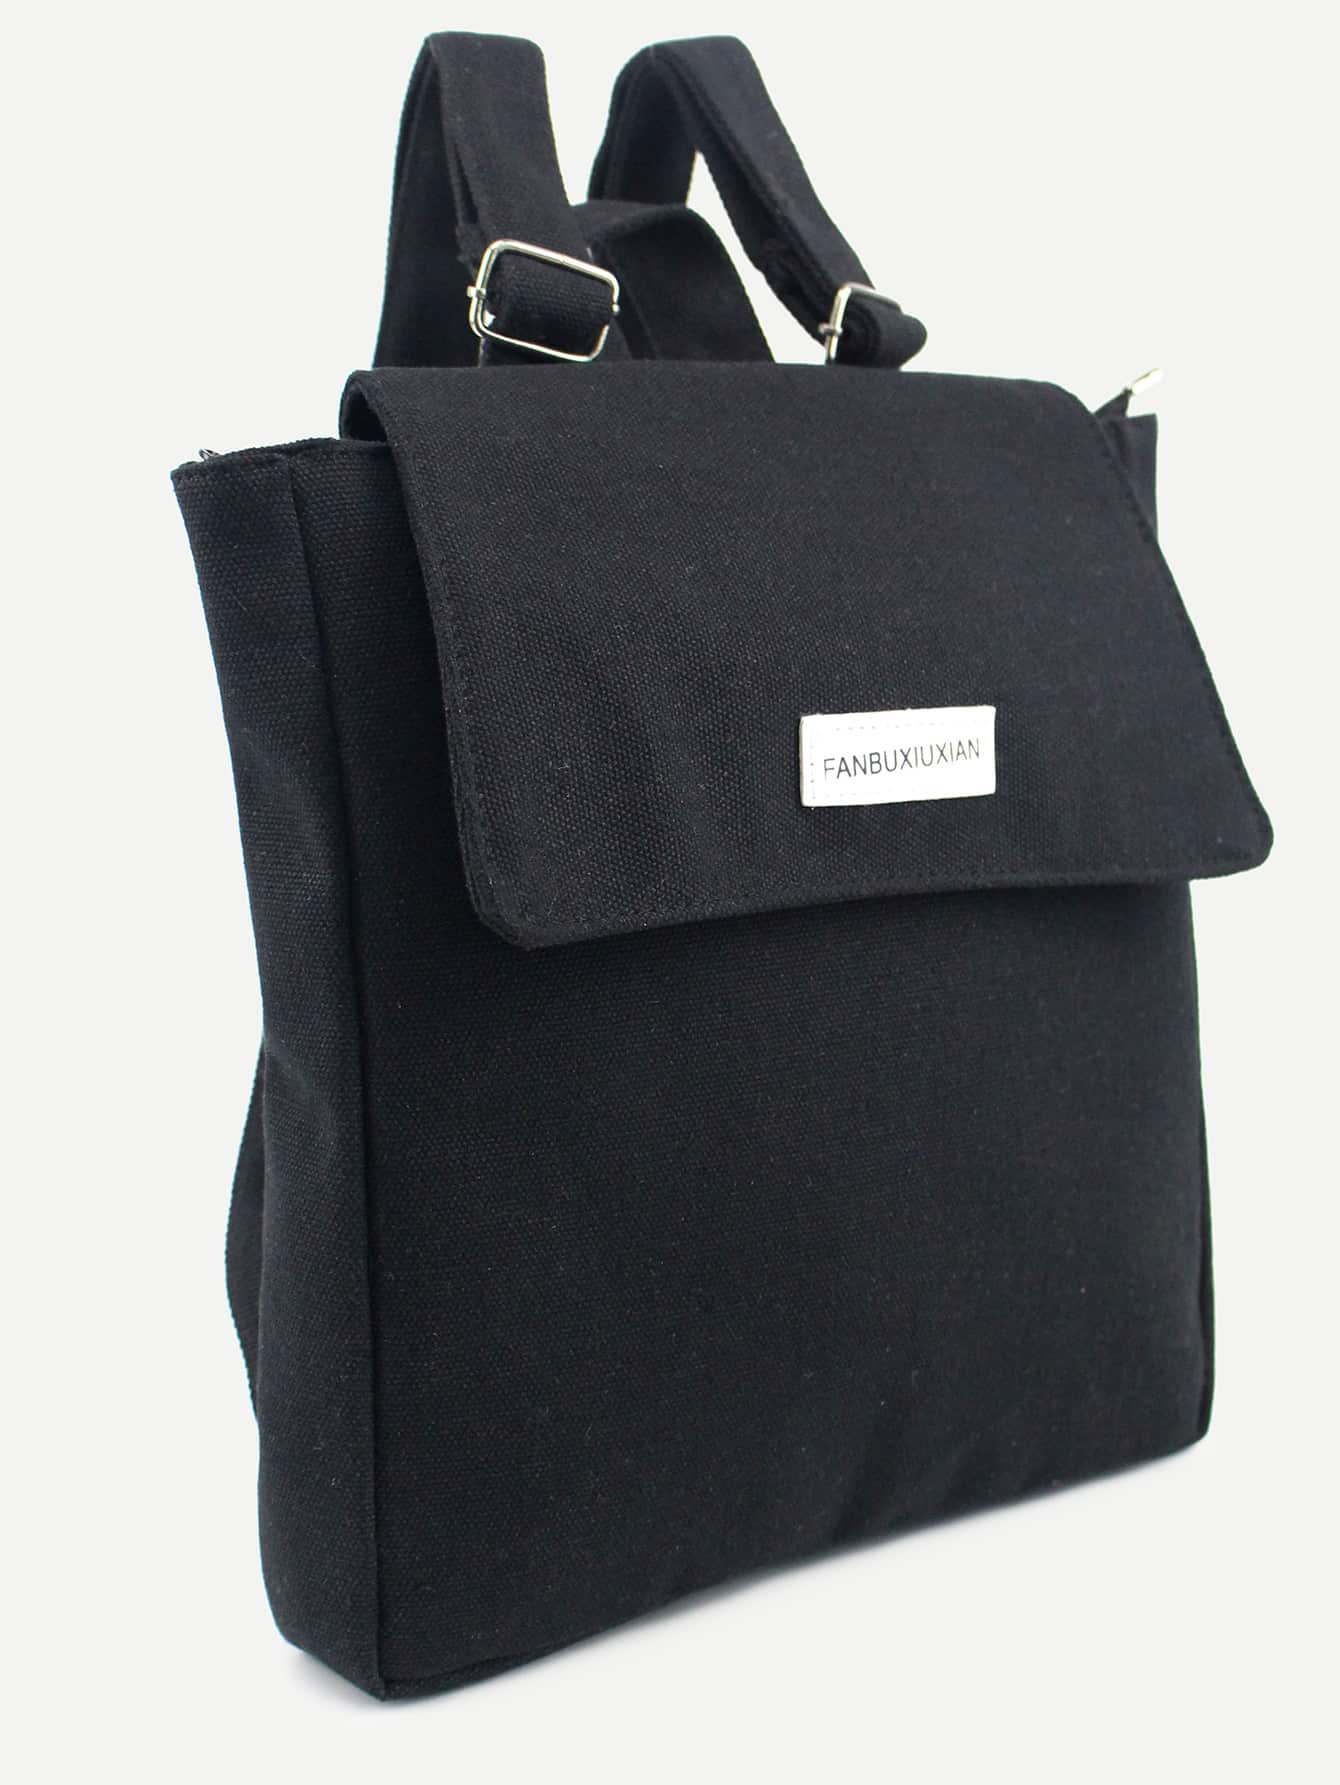 bag160803314_2